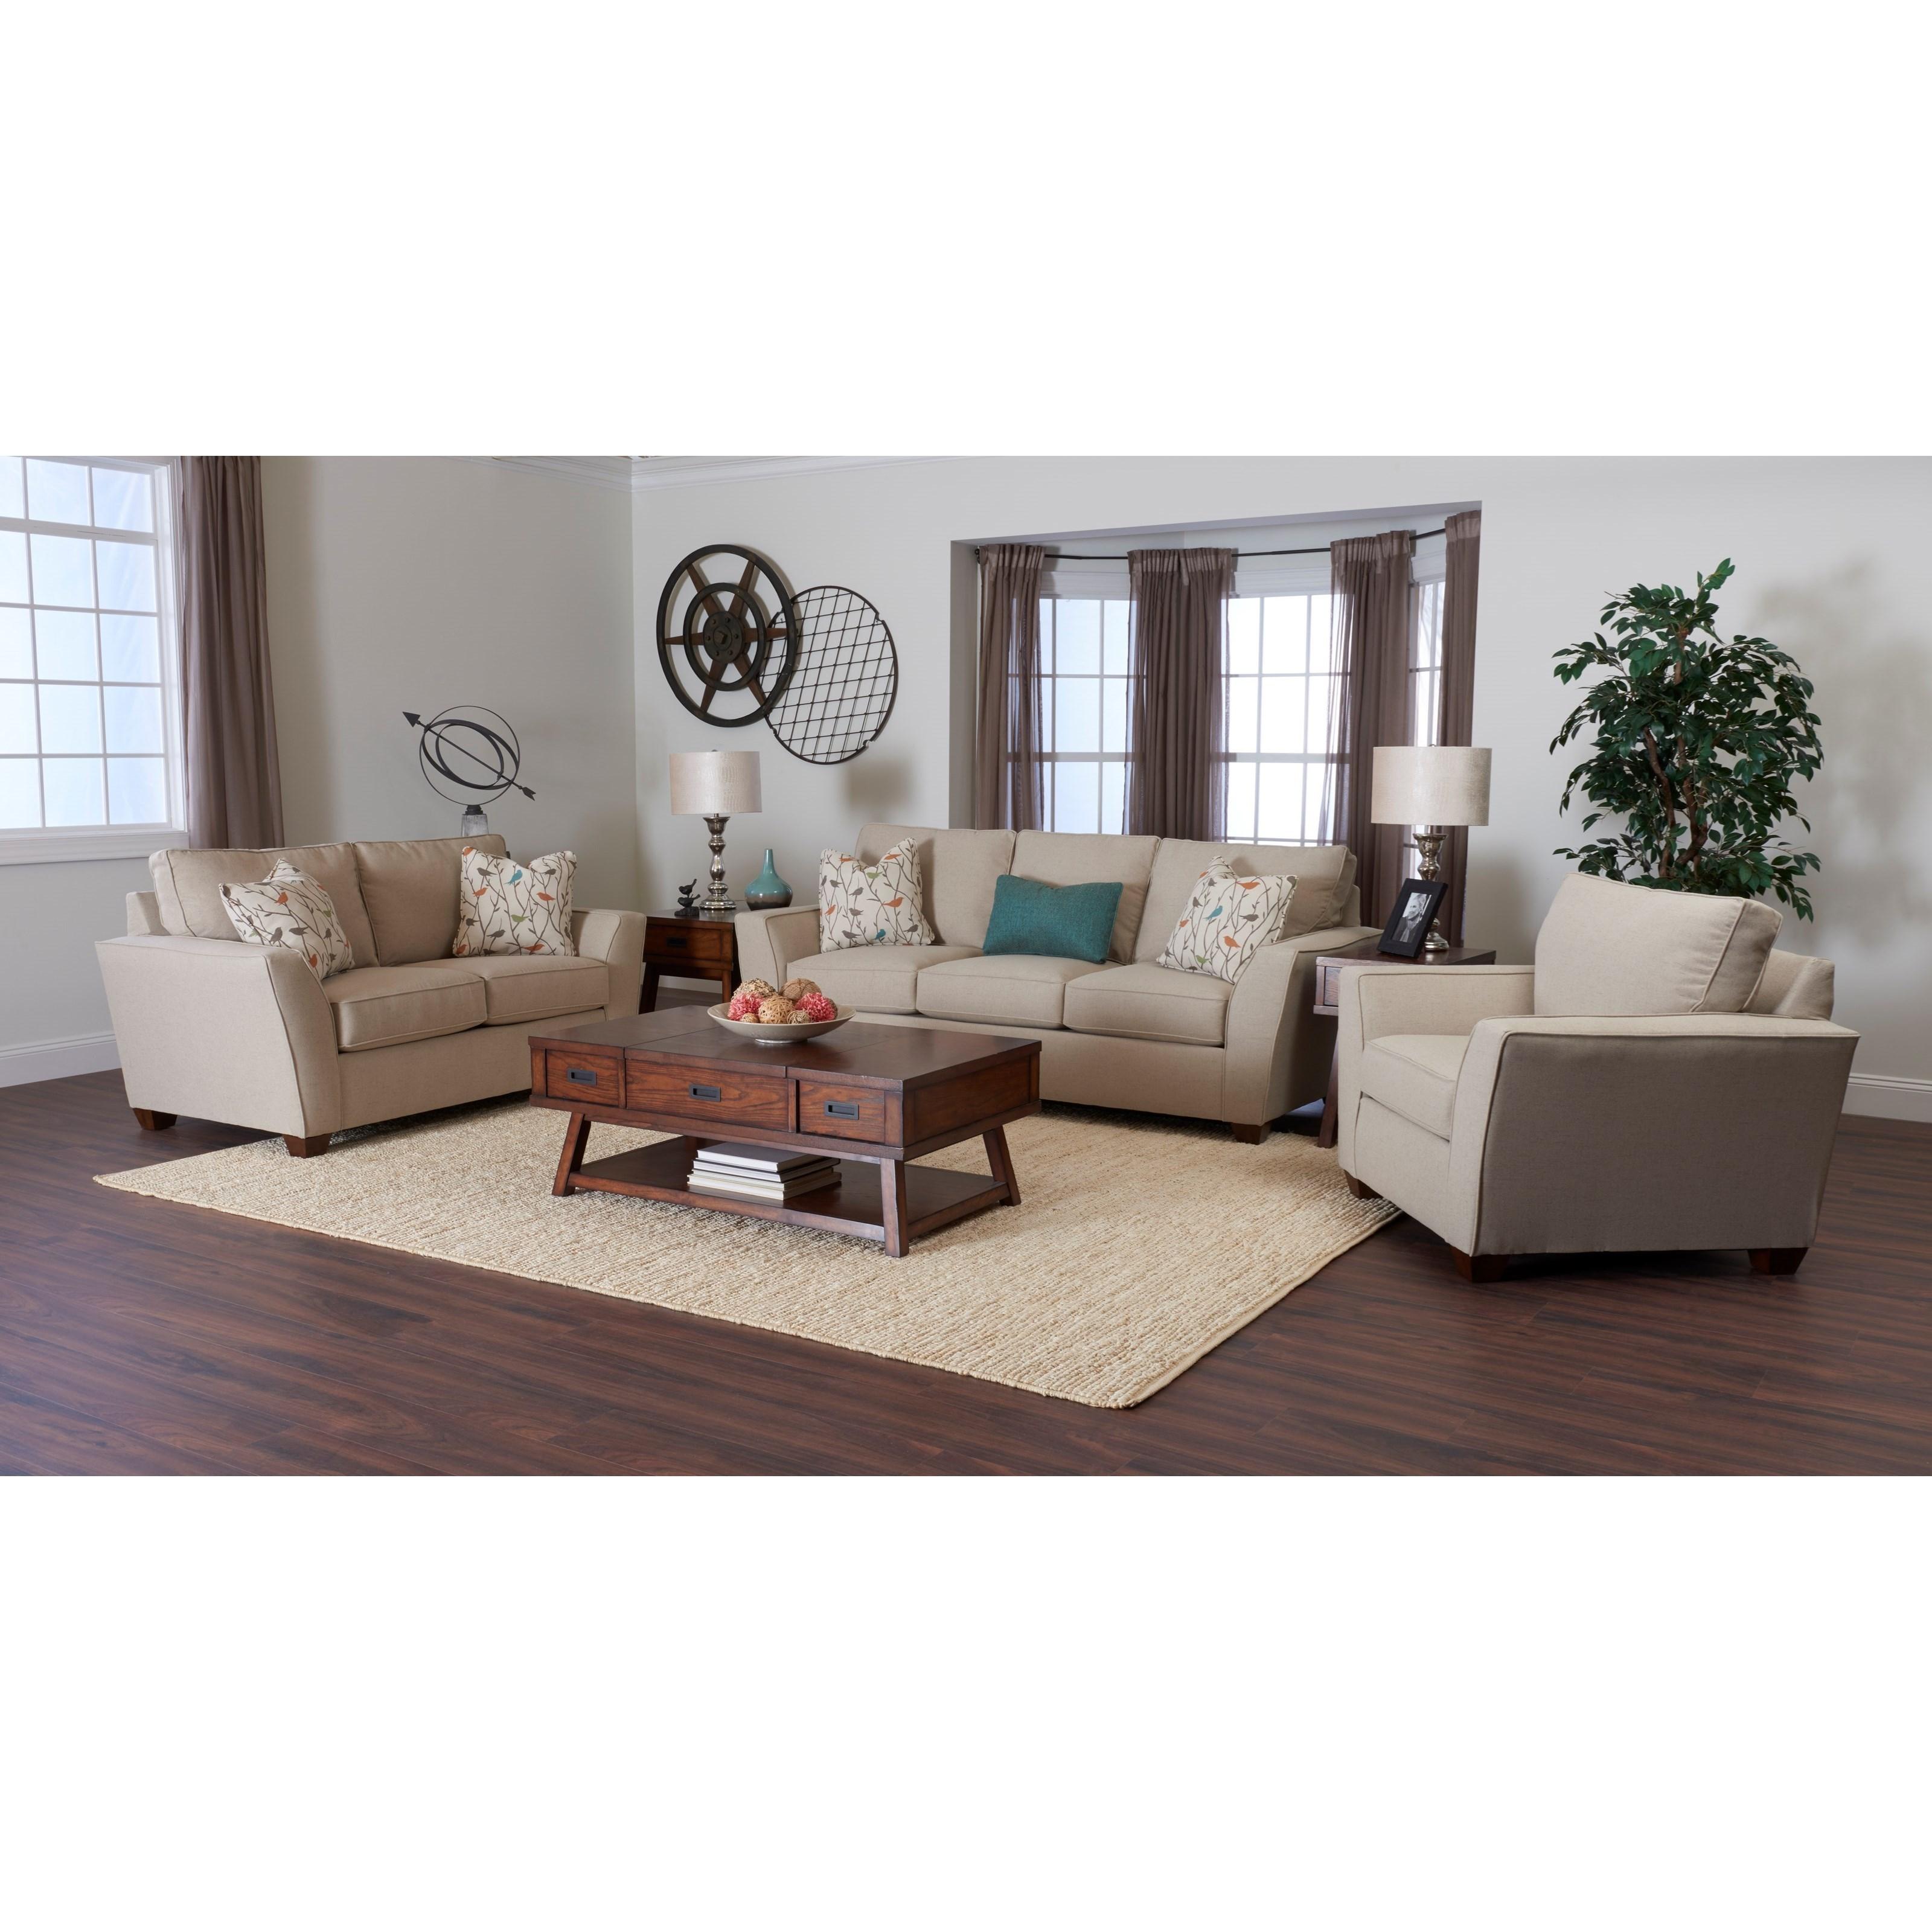 Klaussner Kent Living Room Group Dunk Bright Furniture Stationary L